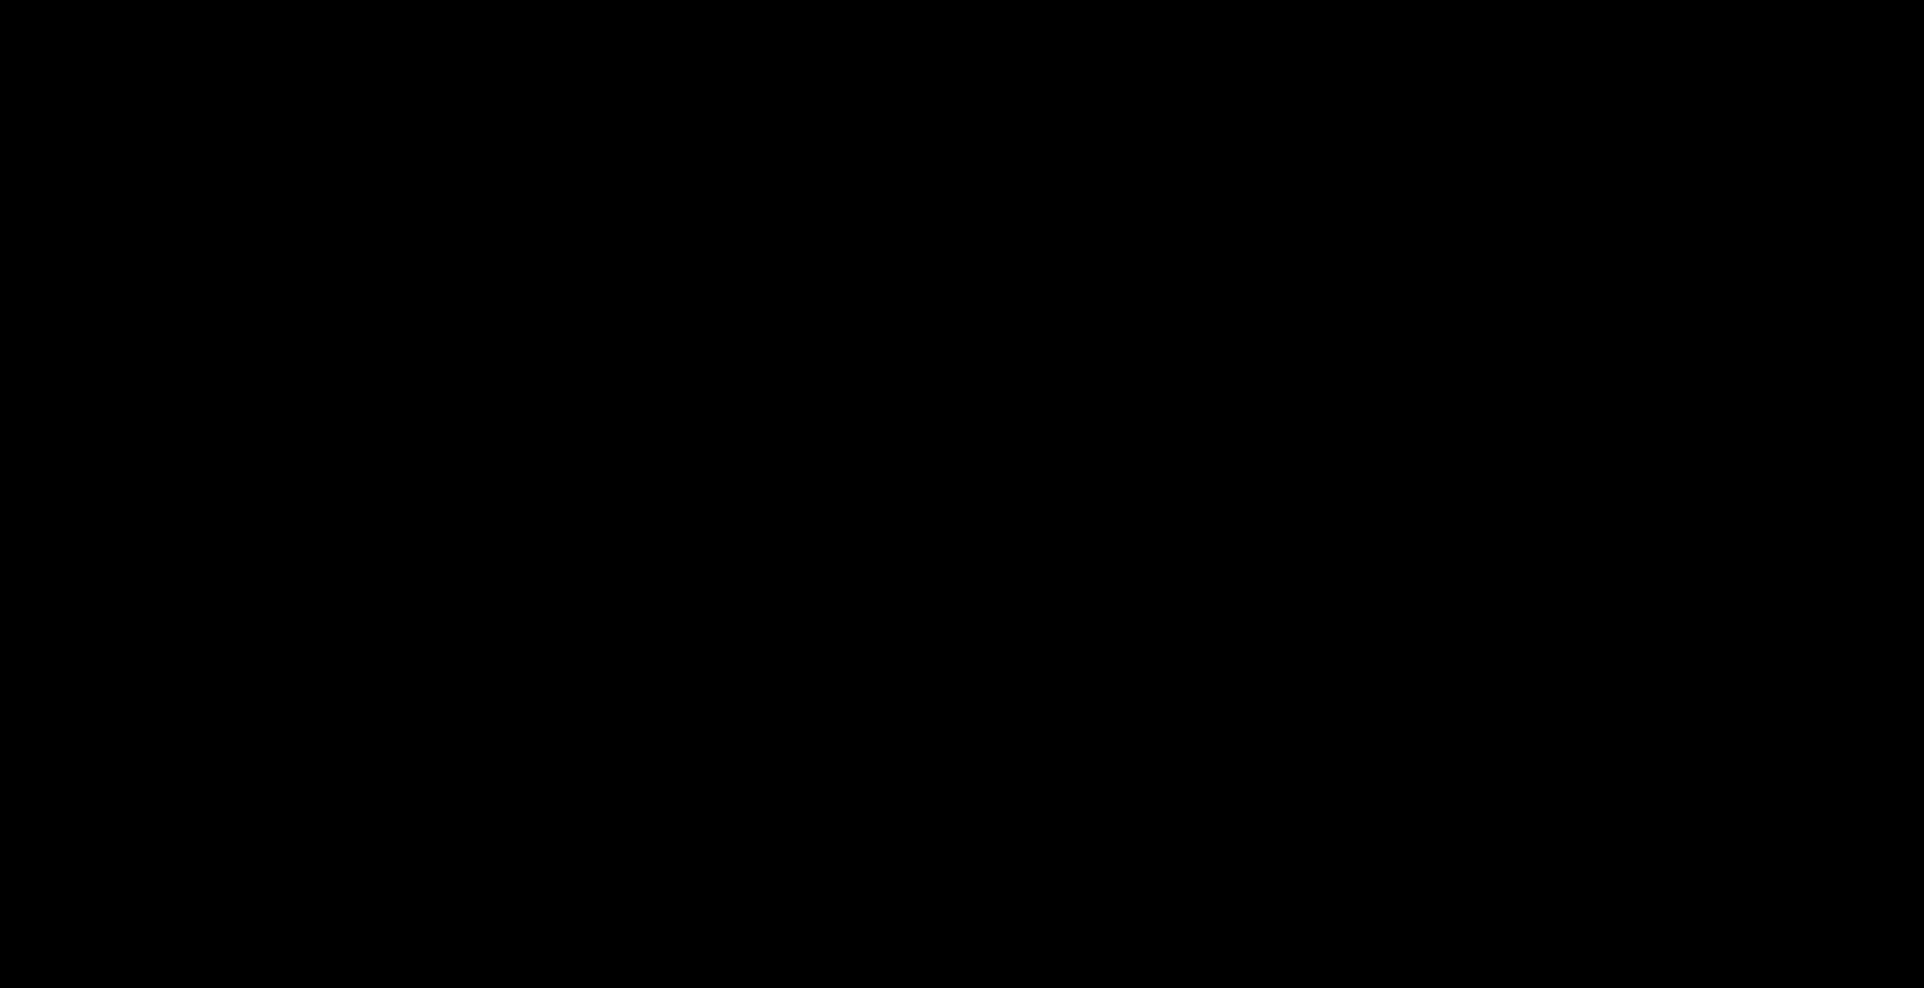 N-(4-Dansyl-d<sub>6</sub>-amino)butyl-1-adamantane carboxamide